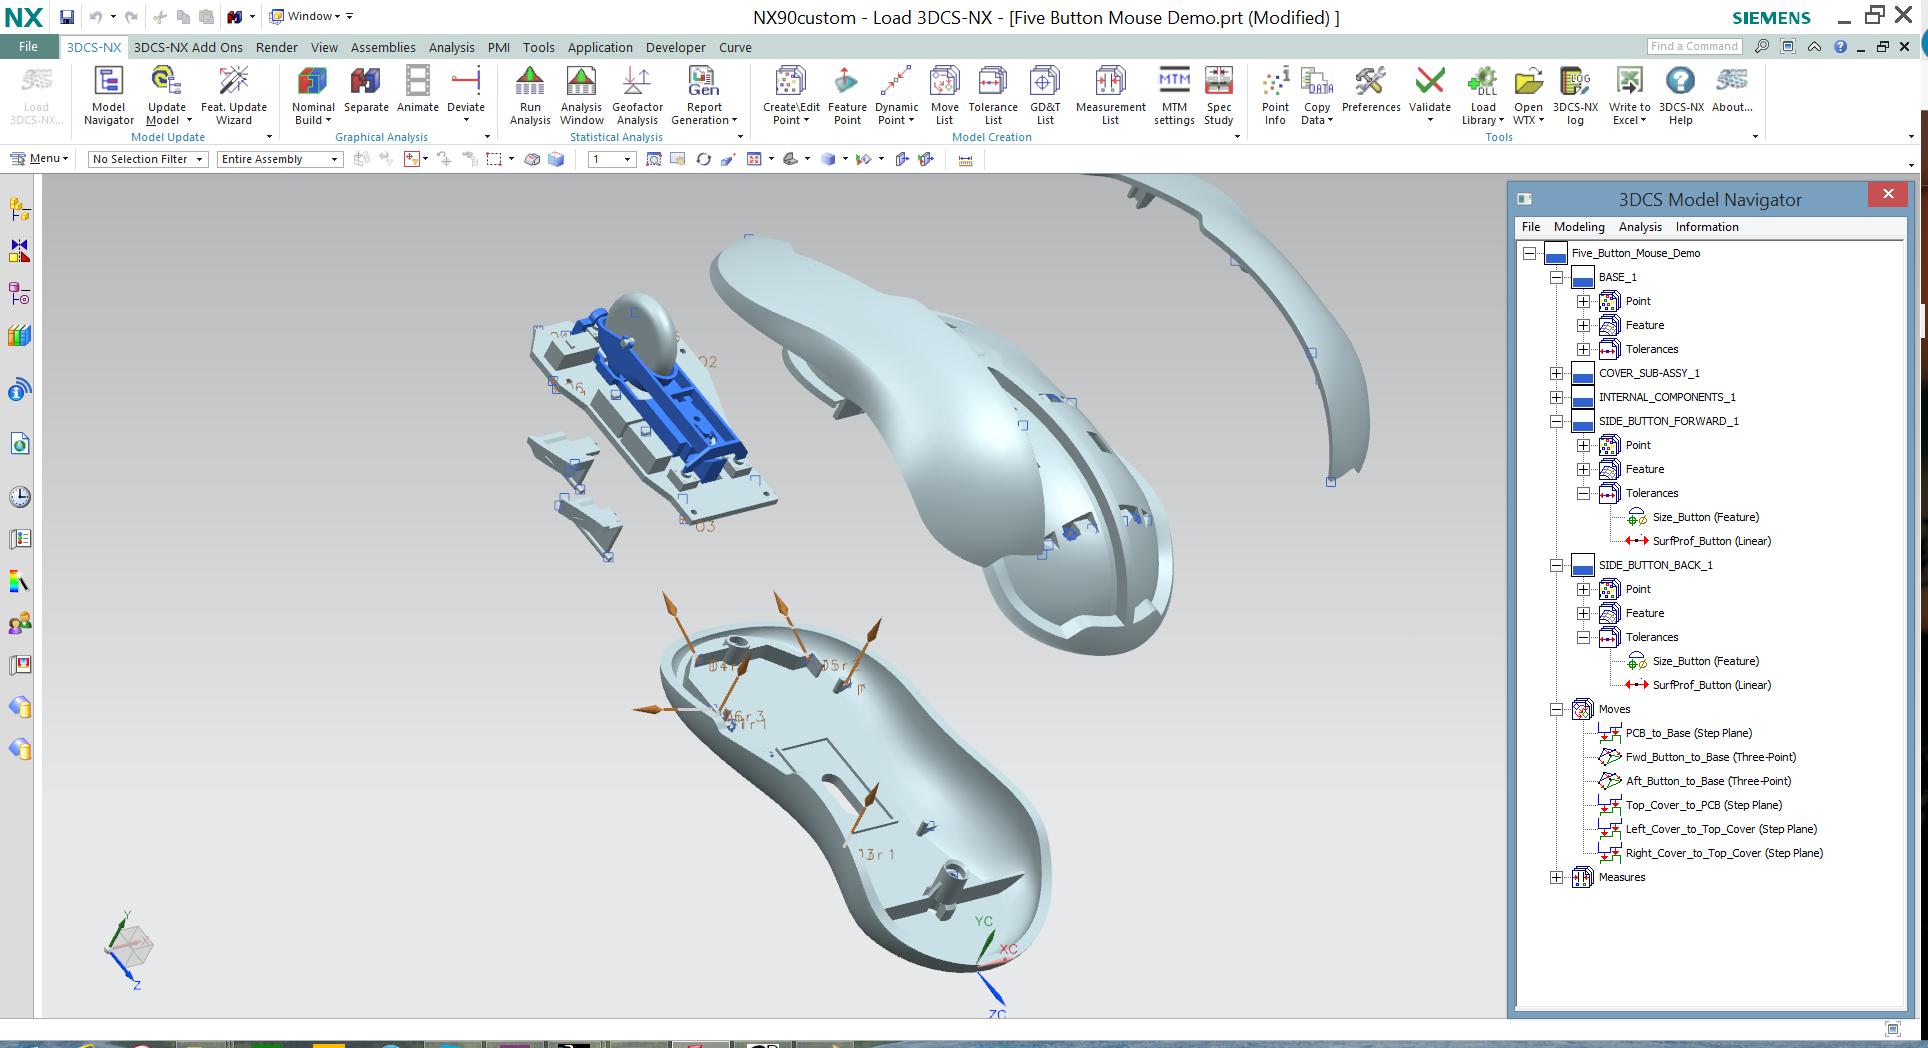 3dcs-nx-mouse-assembly-process